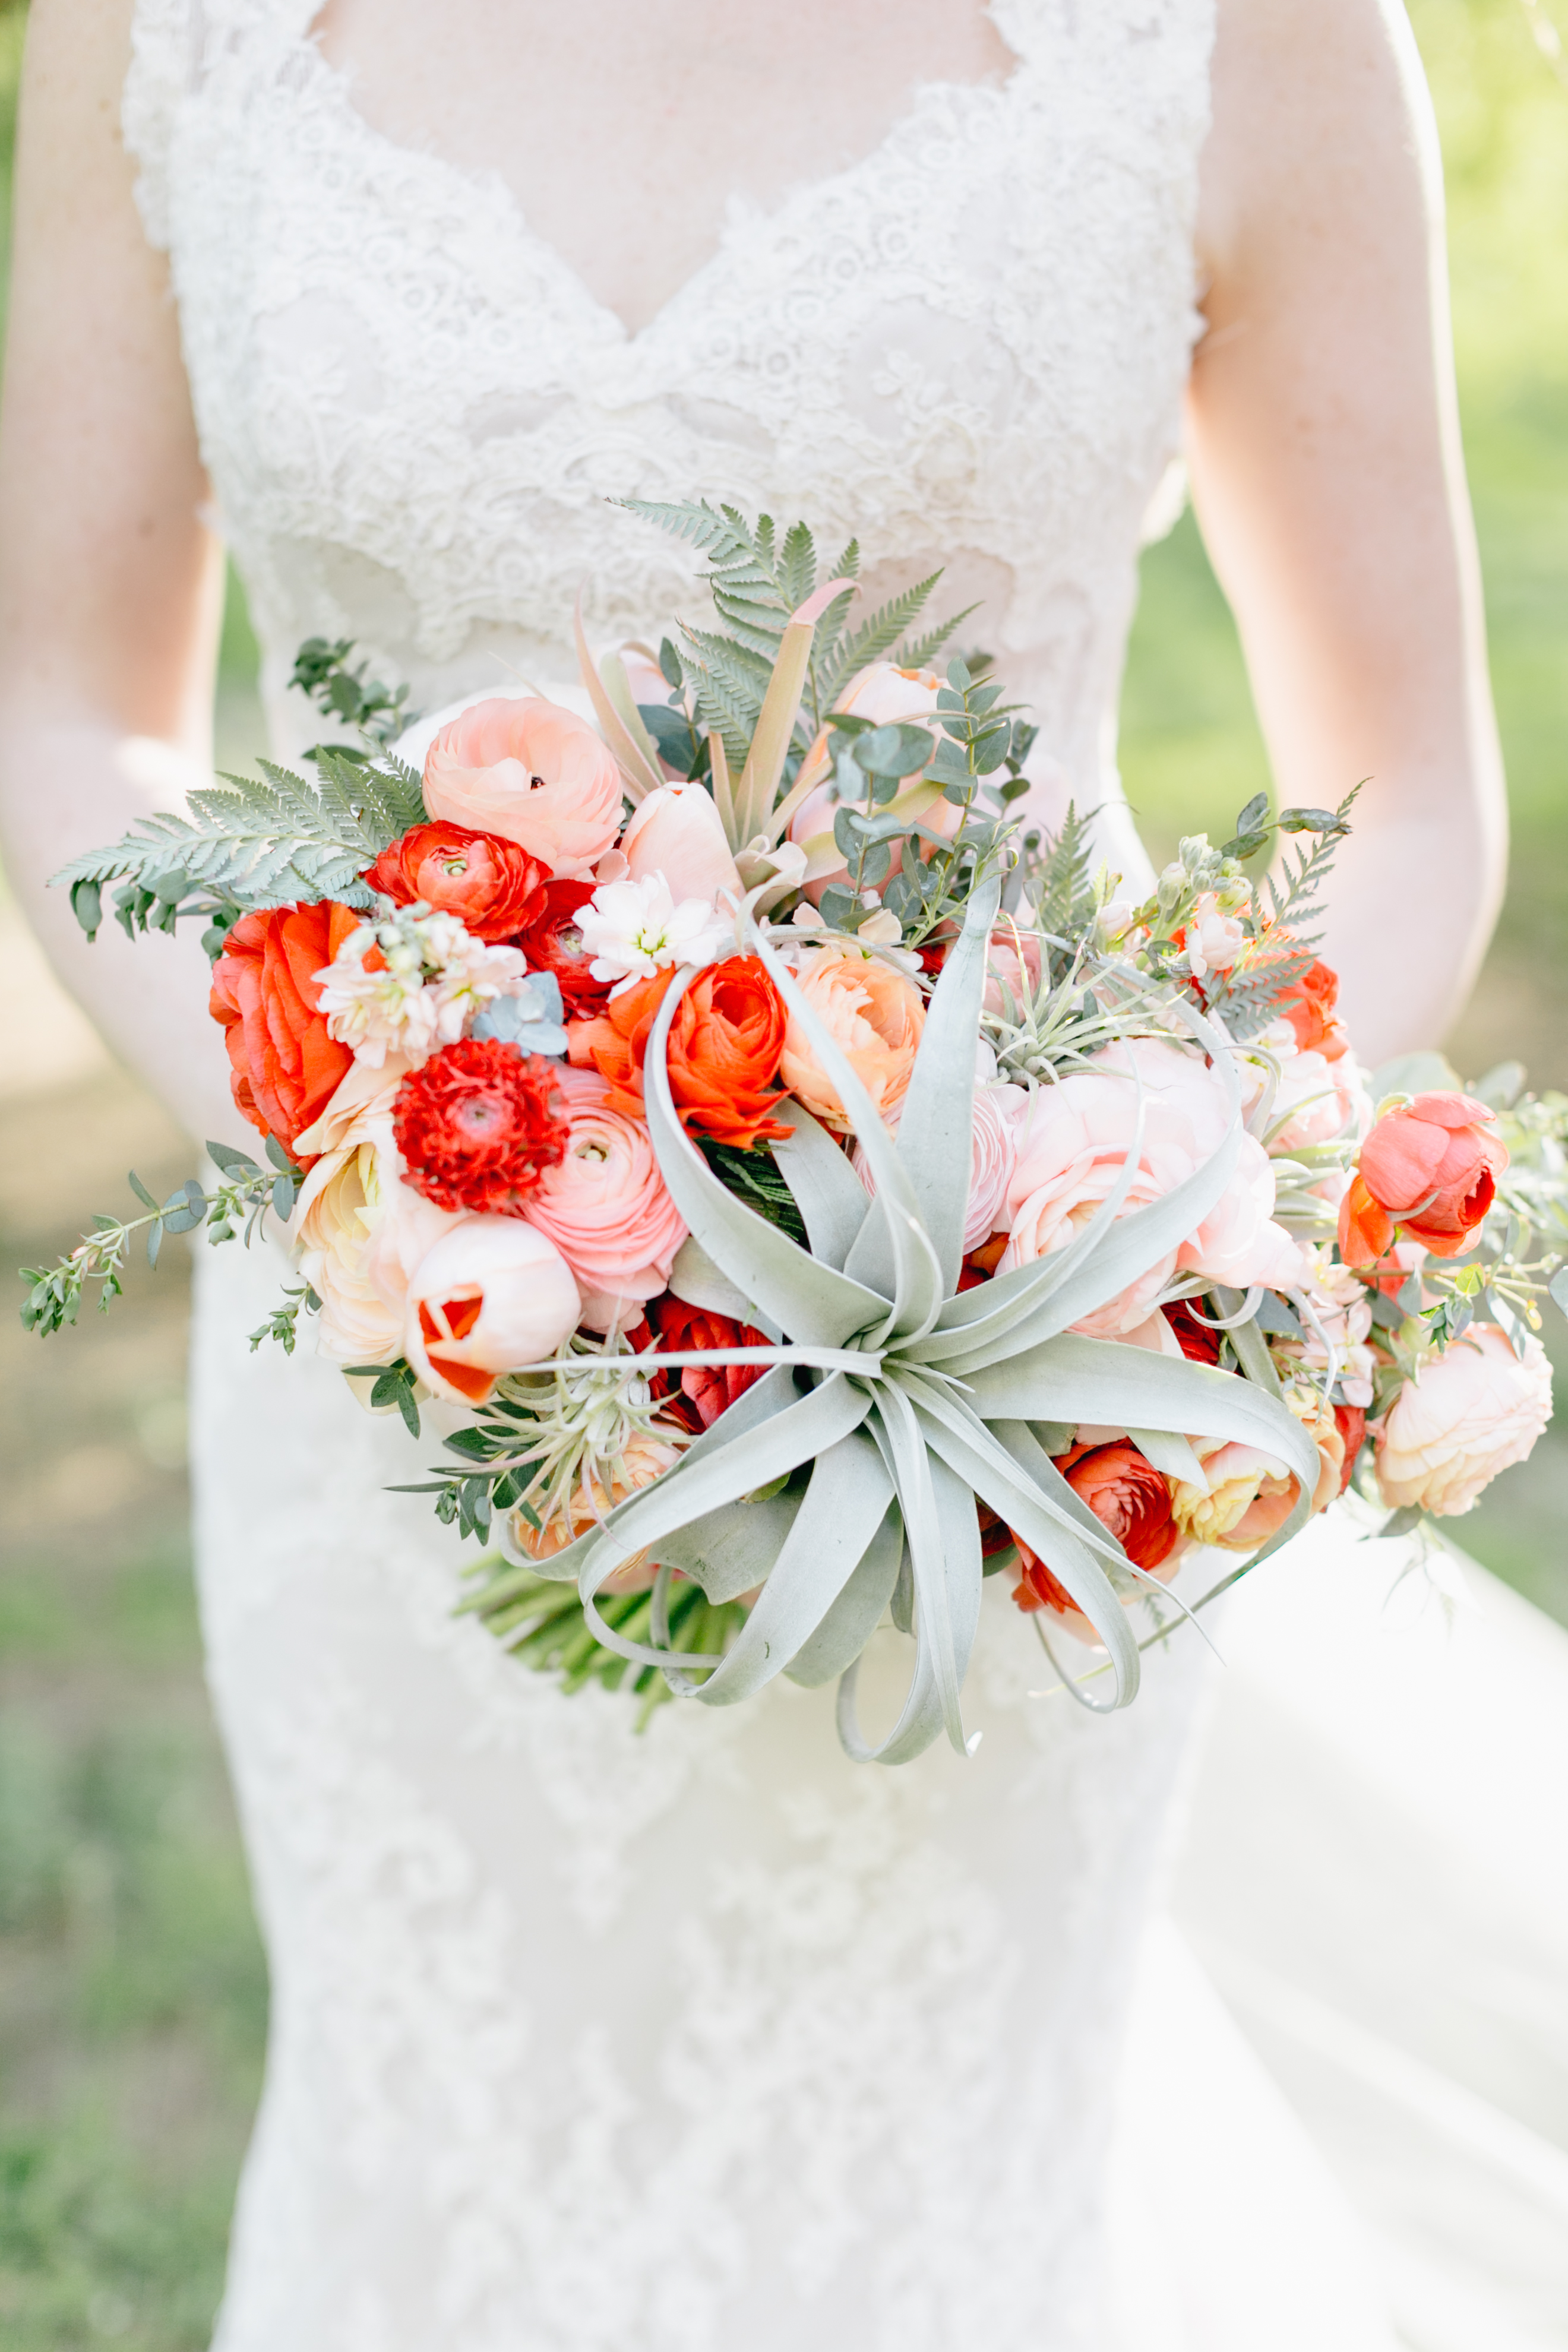 Love 'n Fresh Flowers bridal bouquet